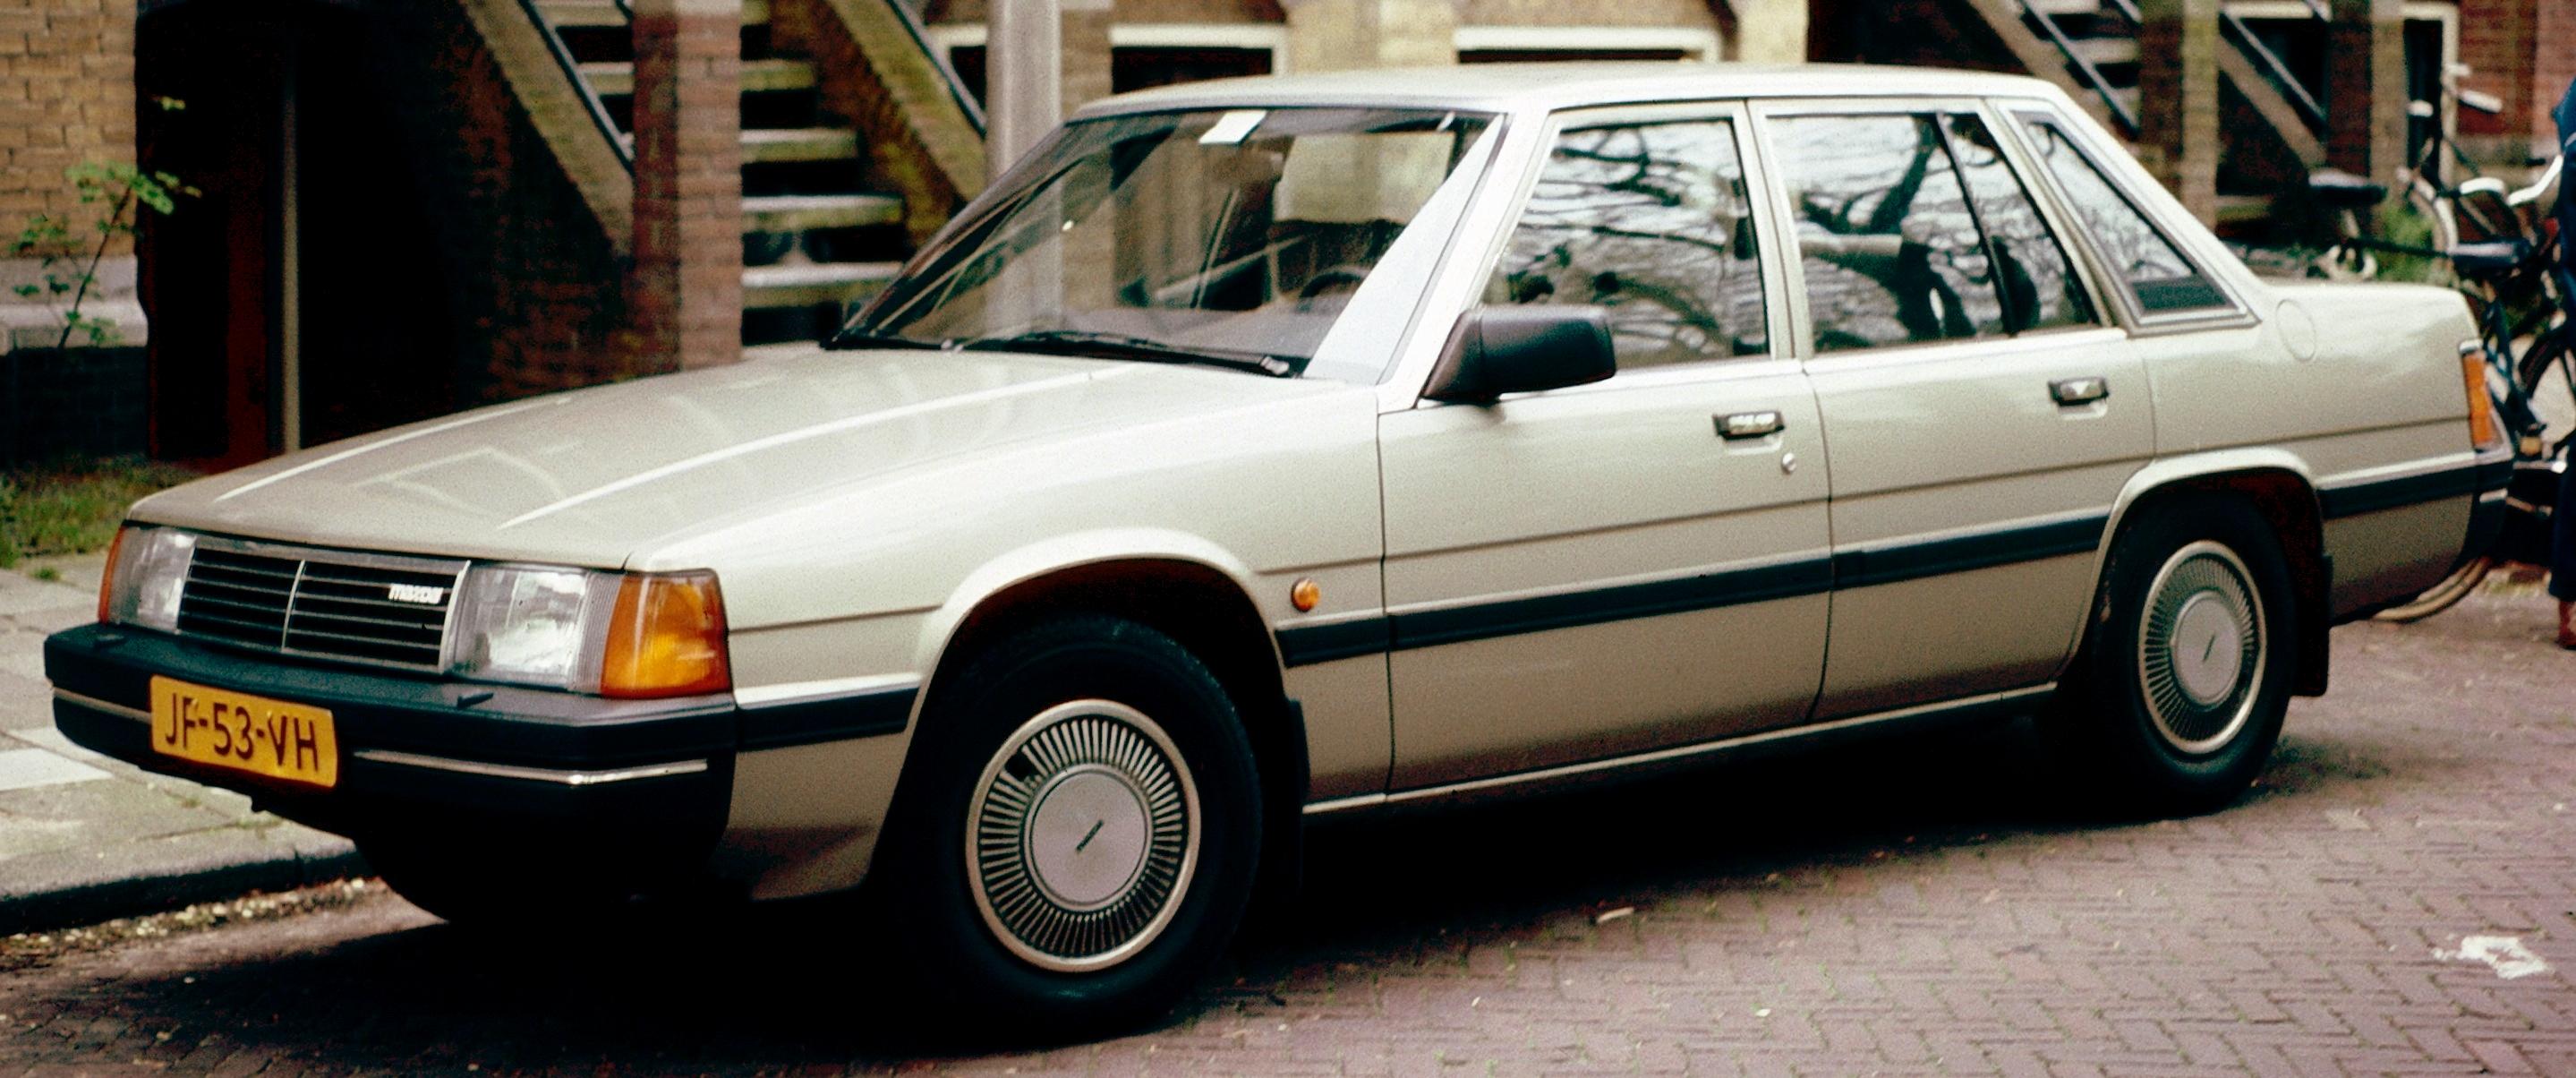 File:Mazda 929 NL 1985.jpg - Wikimedia Commons